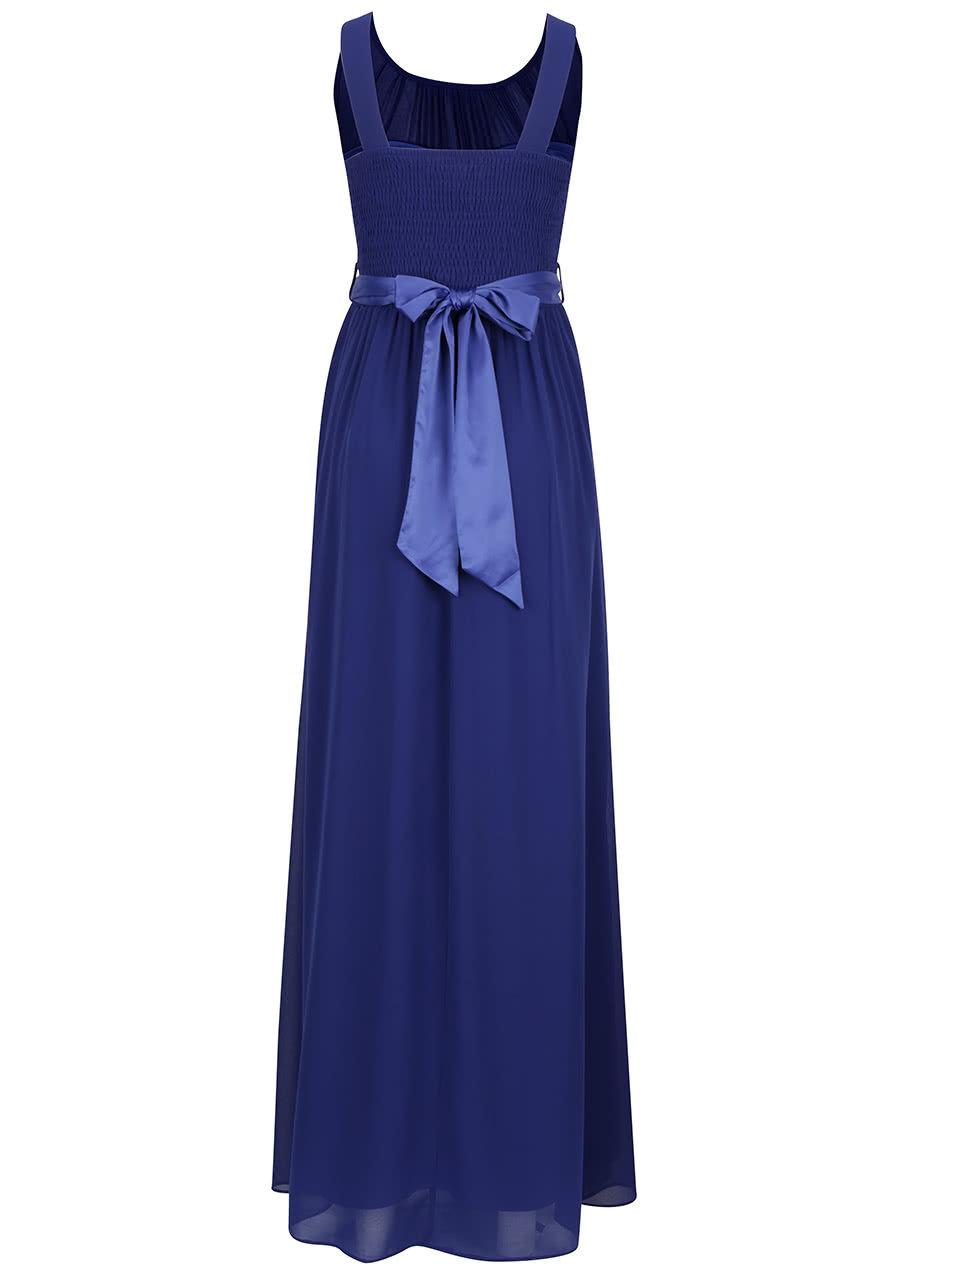 59c506f01782 Modré dlhé šaty Dorothy Perkins ...